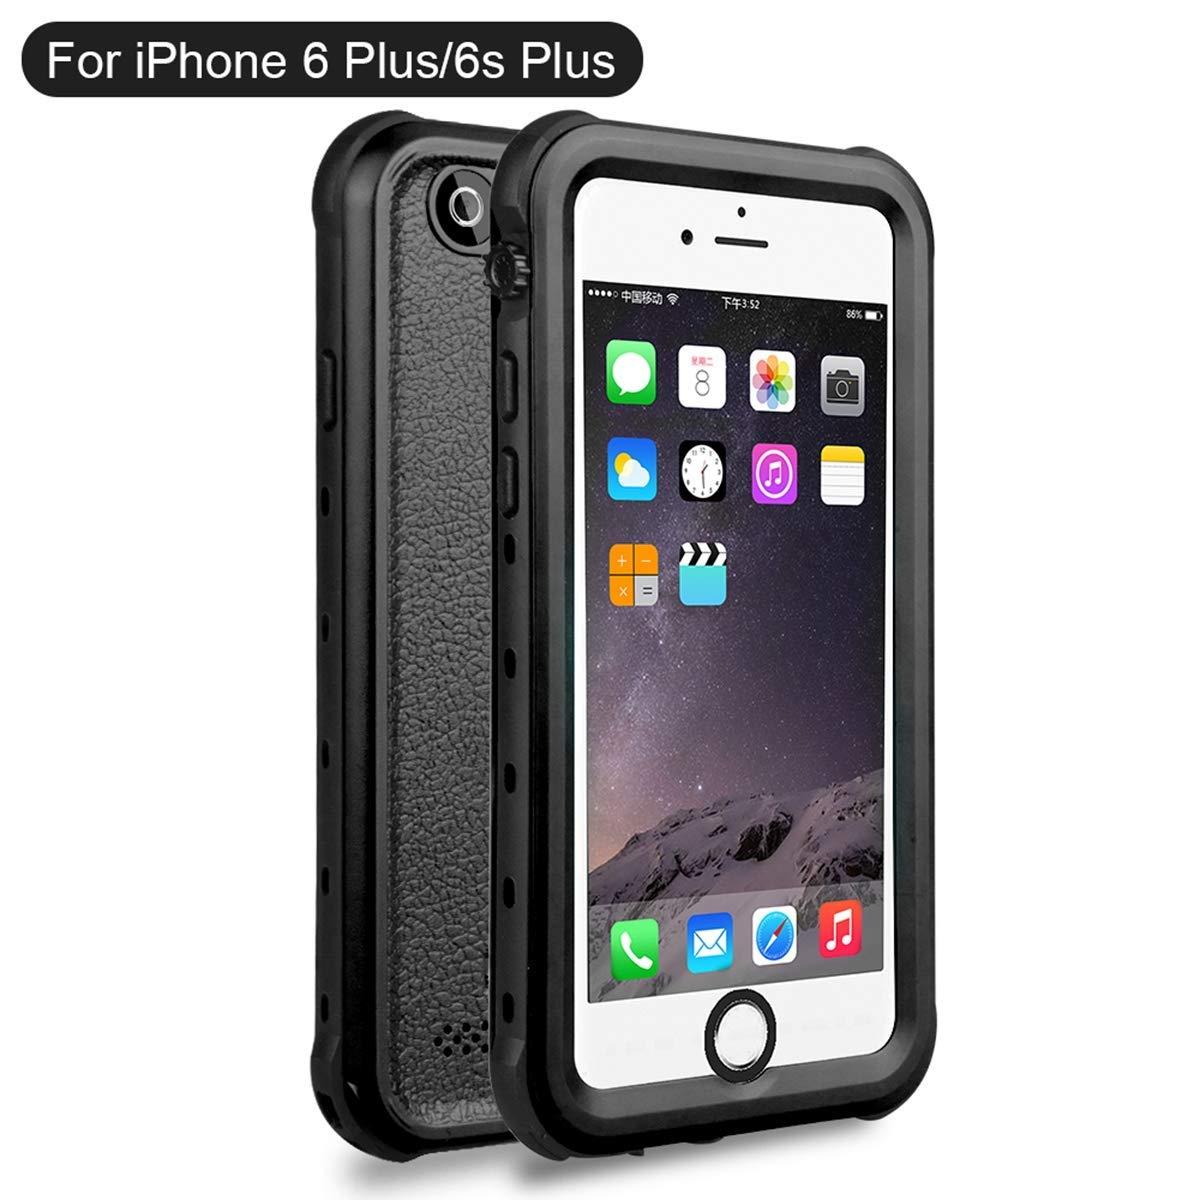 custodia waterproof iphone 6